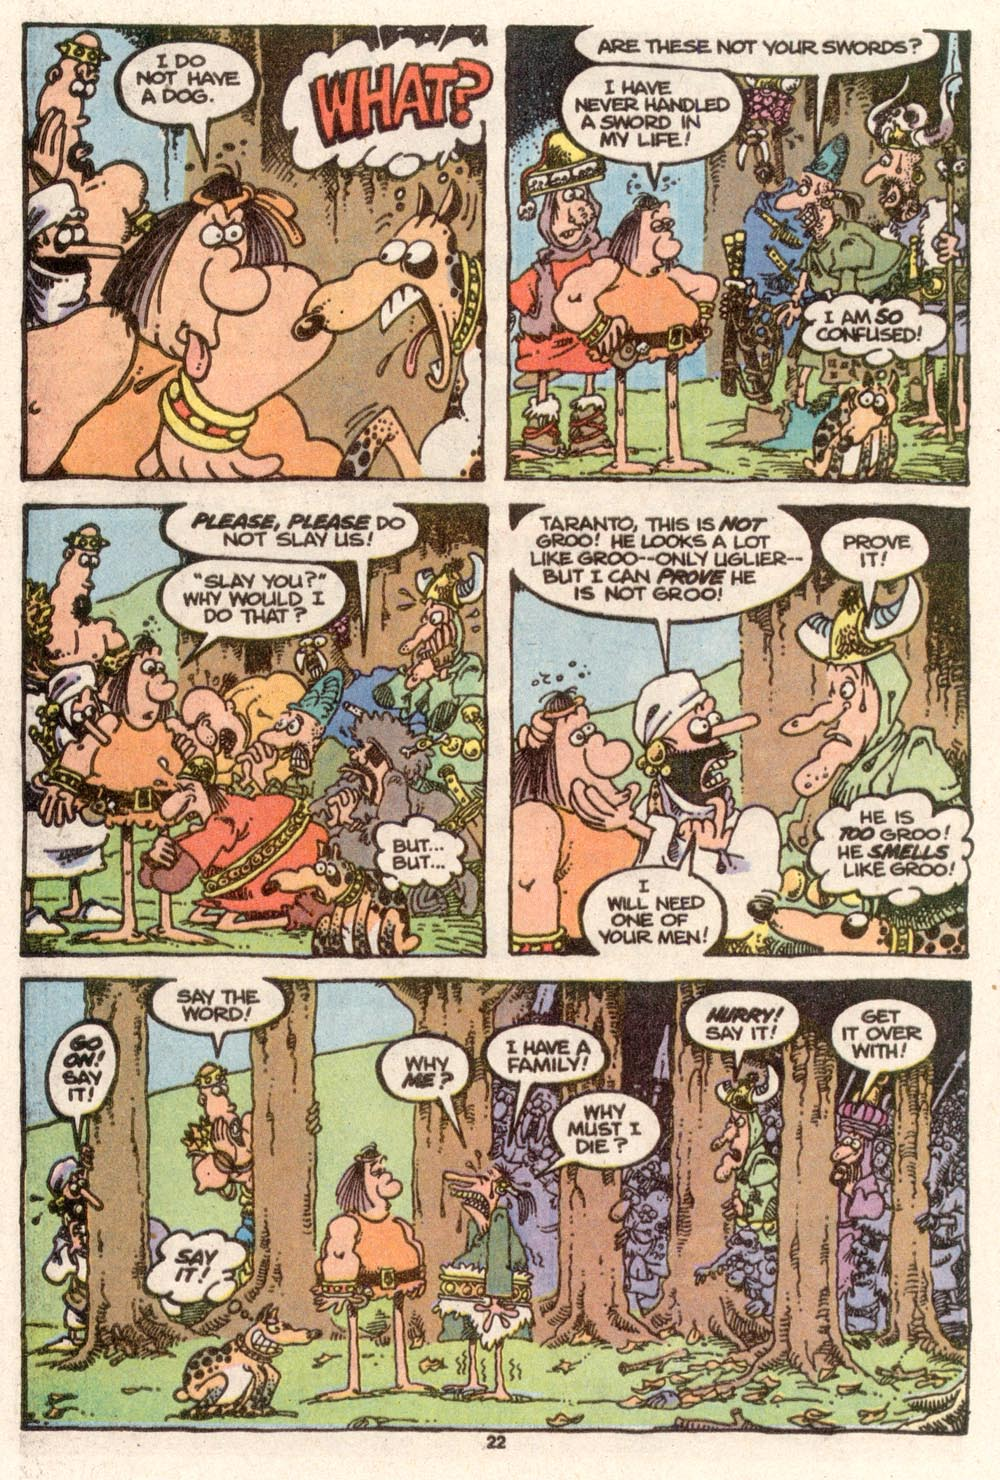 Read online Sergio Aragonés Groo the Wanderer comic -  Issue #73 - 16